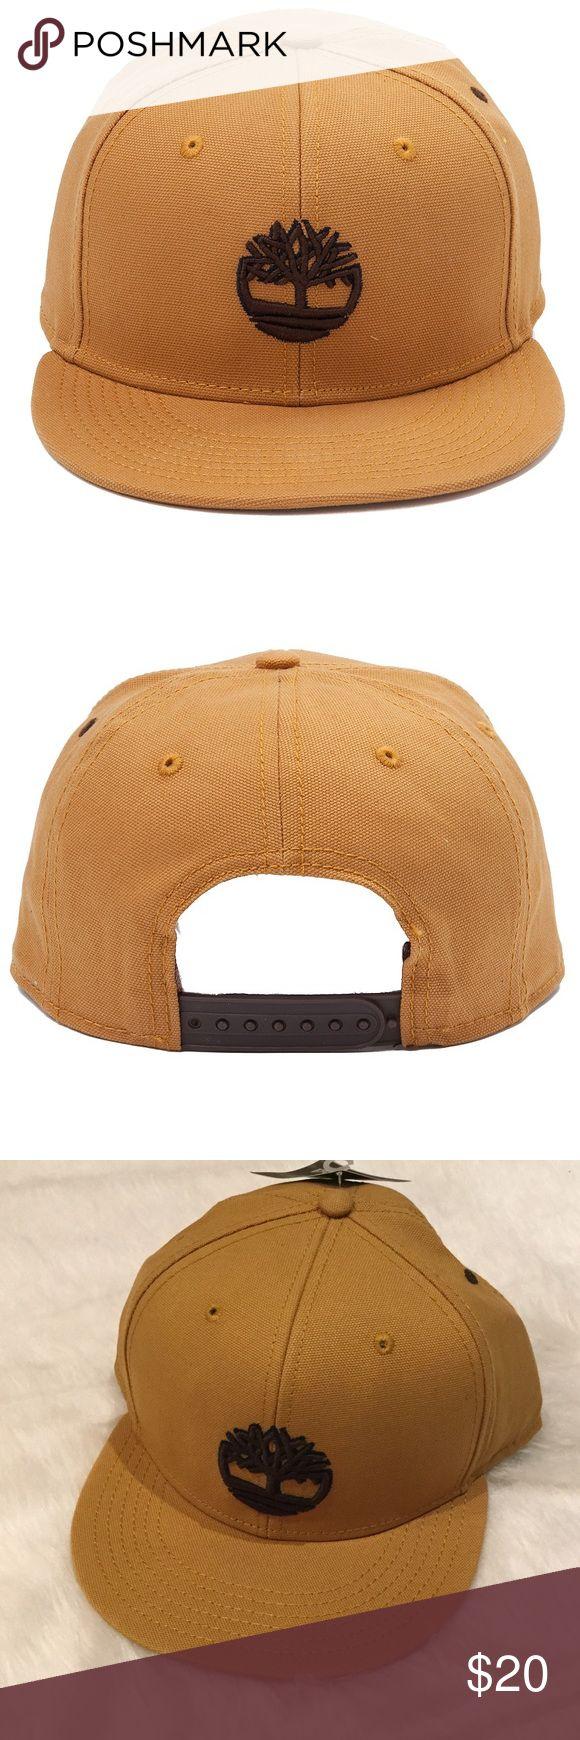 "NWT Timberland Raised Logo Snapback Raised logo embroidery at front, flat brim.  Adjustable snapback closure.  Sweatband at reverse.2 7/8"" brim.  100% cotton.  Color:  Wheat. Timberland Accessories Hats"